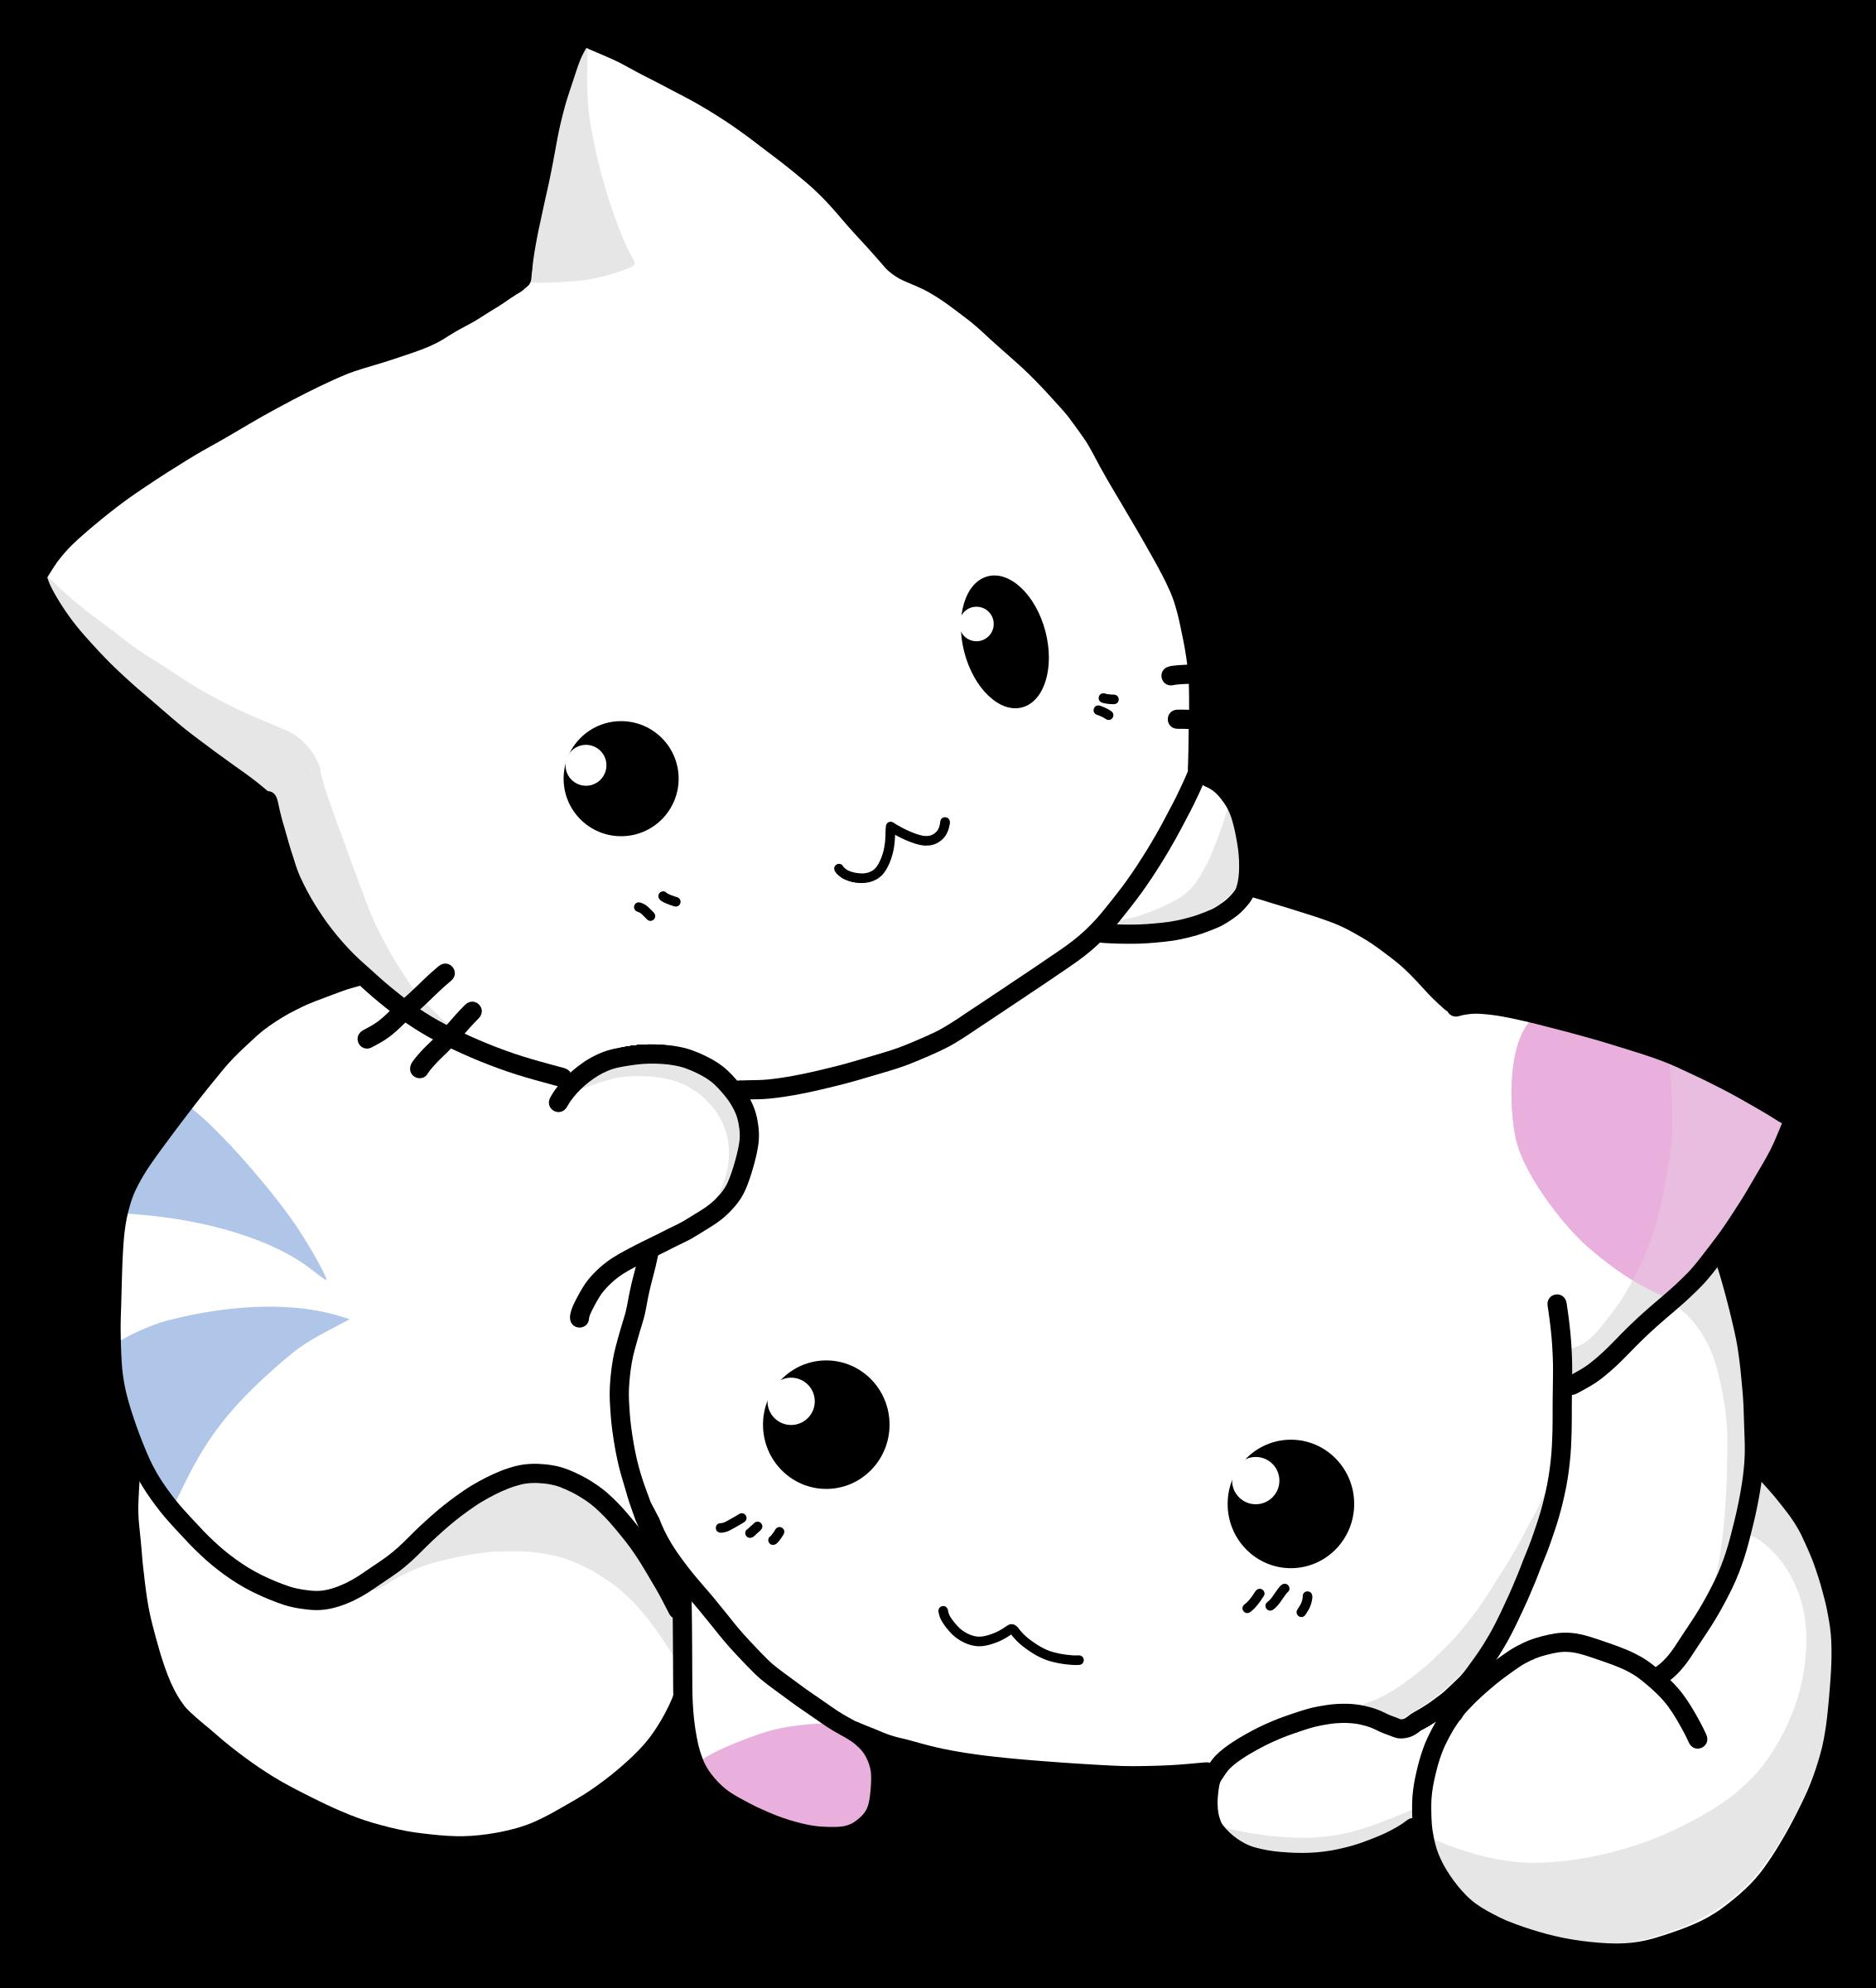 Clipart Cuty Cats Cute Anime Cat Anime Kitten Kitten Drawing